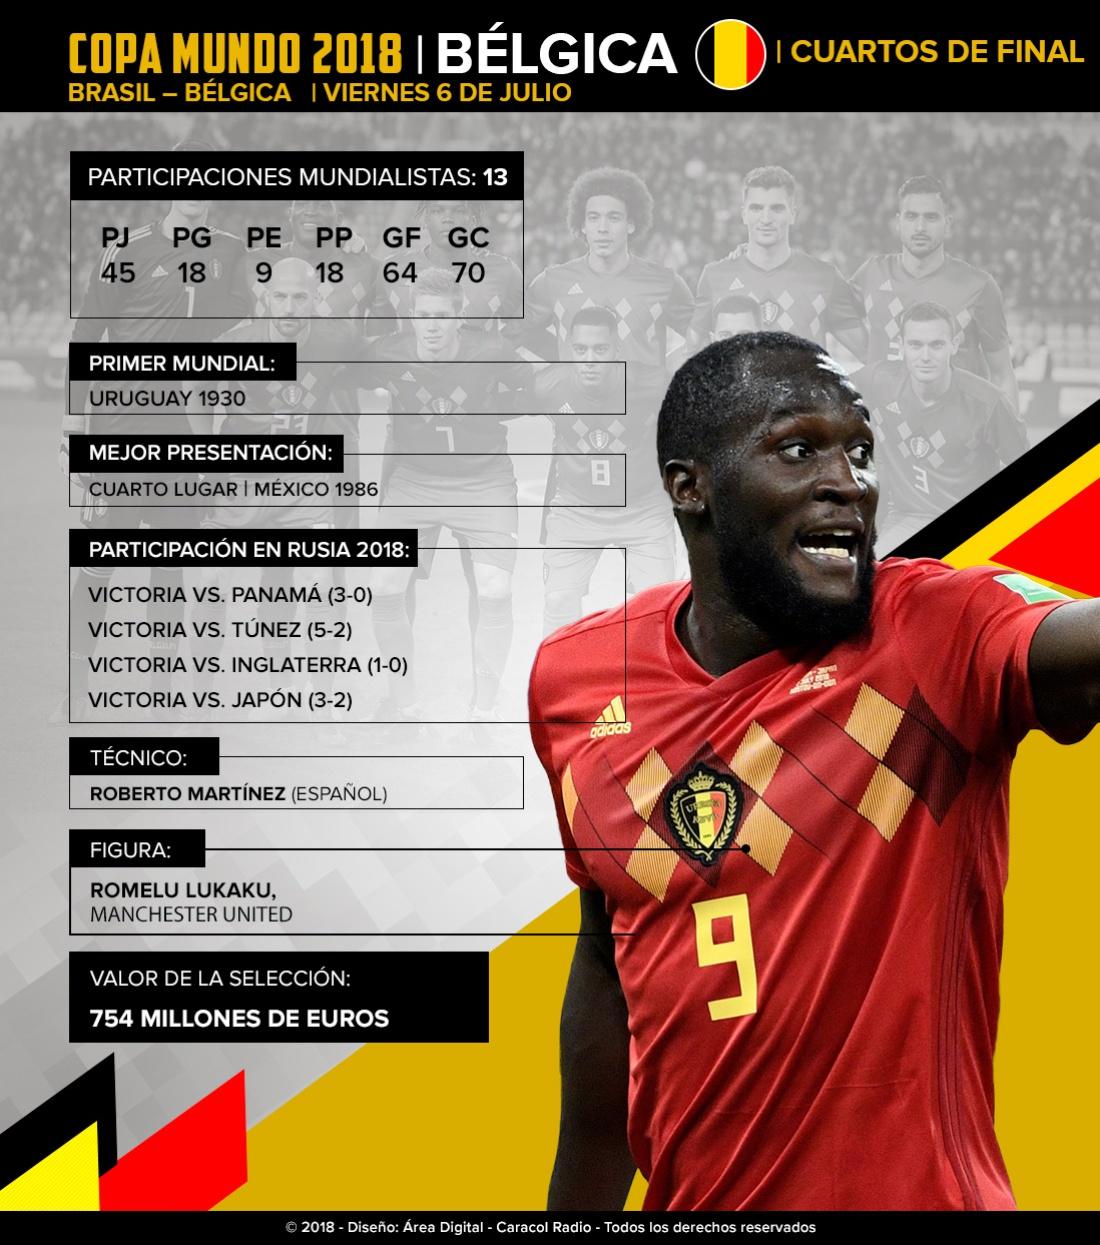 Bélgica Mundial Rusia 2018: Bélgica sueña con su segunda semifinal, soportado en su poder ofensivo